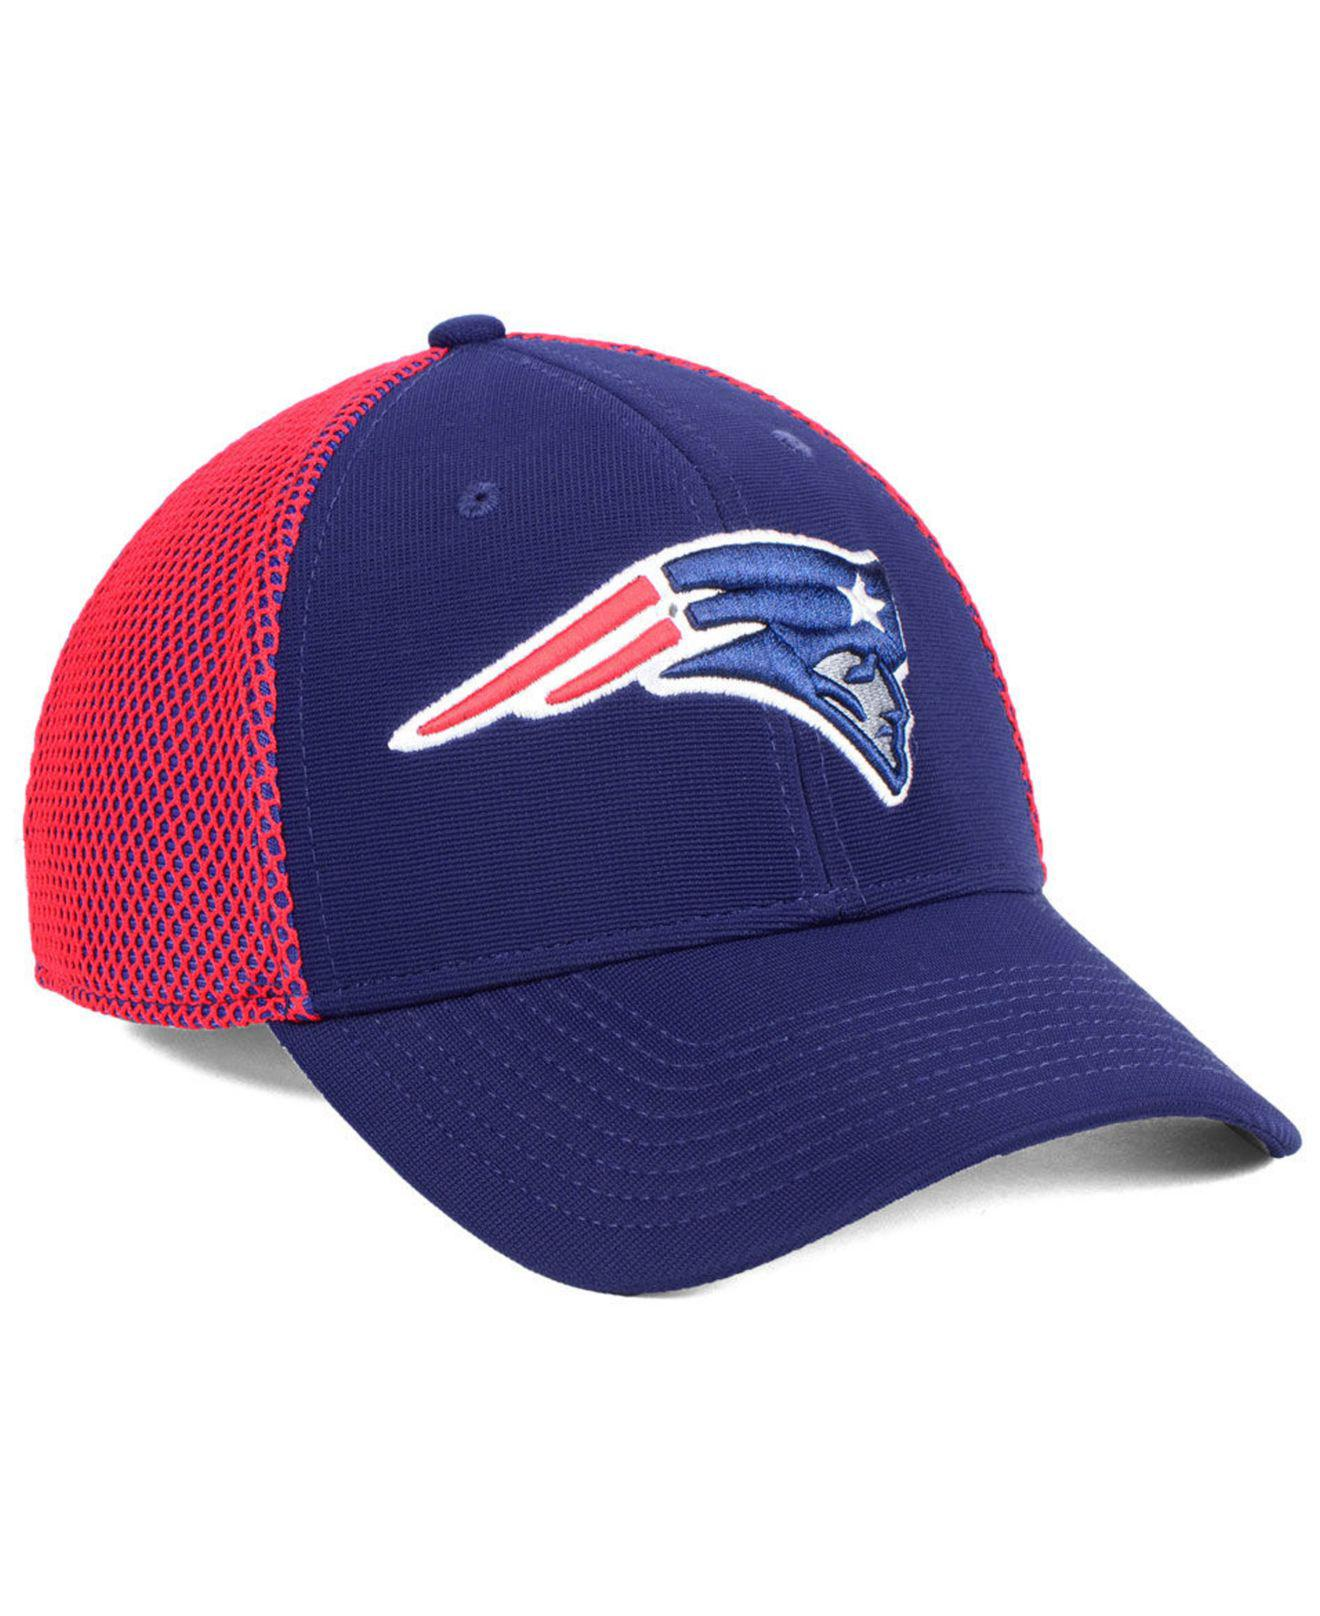 42ef42dc98052 ... purchase 47 brand blue new england patriots comfort contender flex cap  for men lyst. view